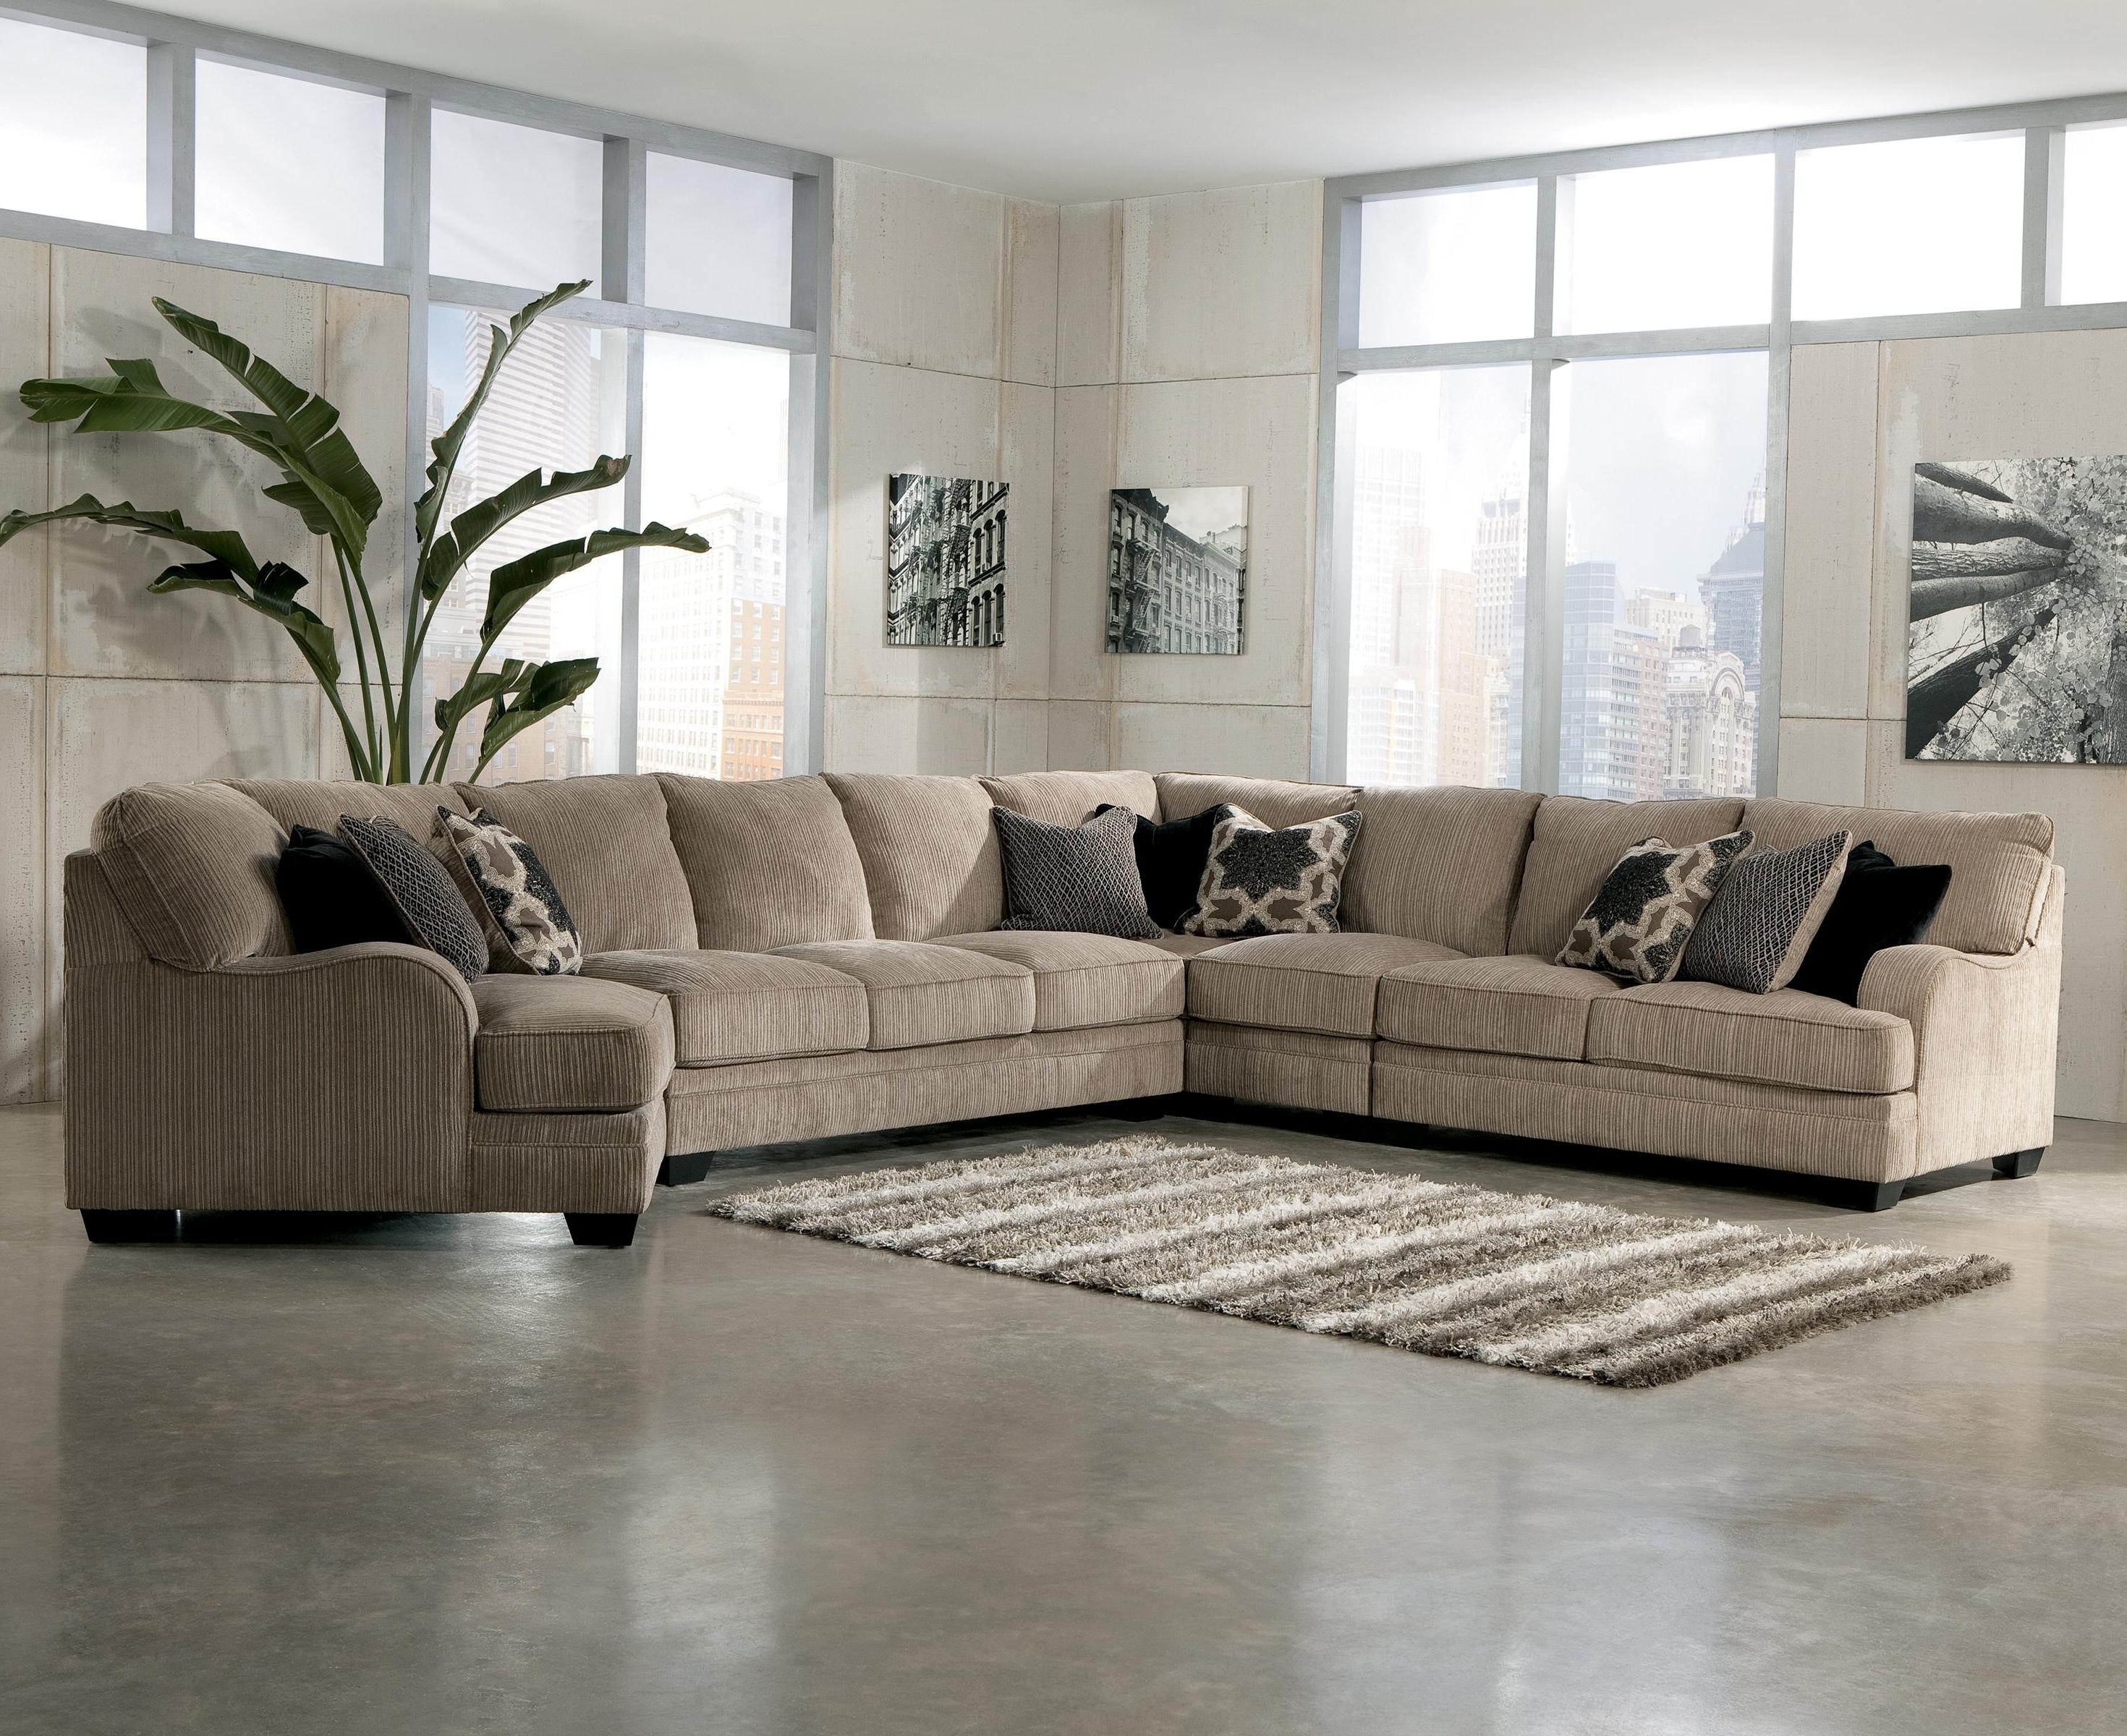 2018 Jonesboro Ar Sectional Sofas Within Signature Designashley Katisha – Platinum 5 Piece Sectional (View 2 of 15)